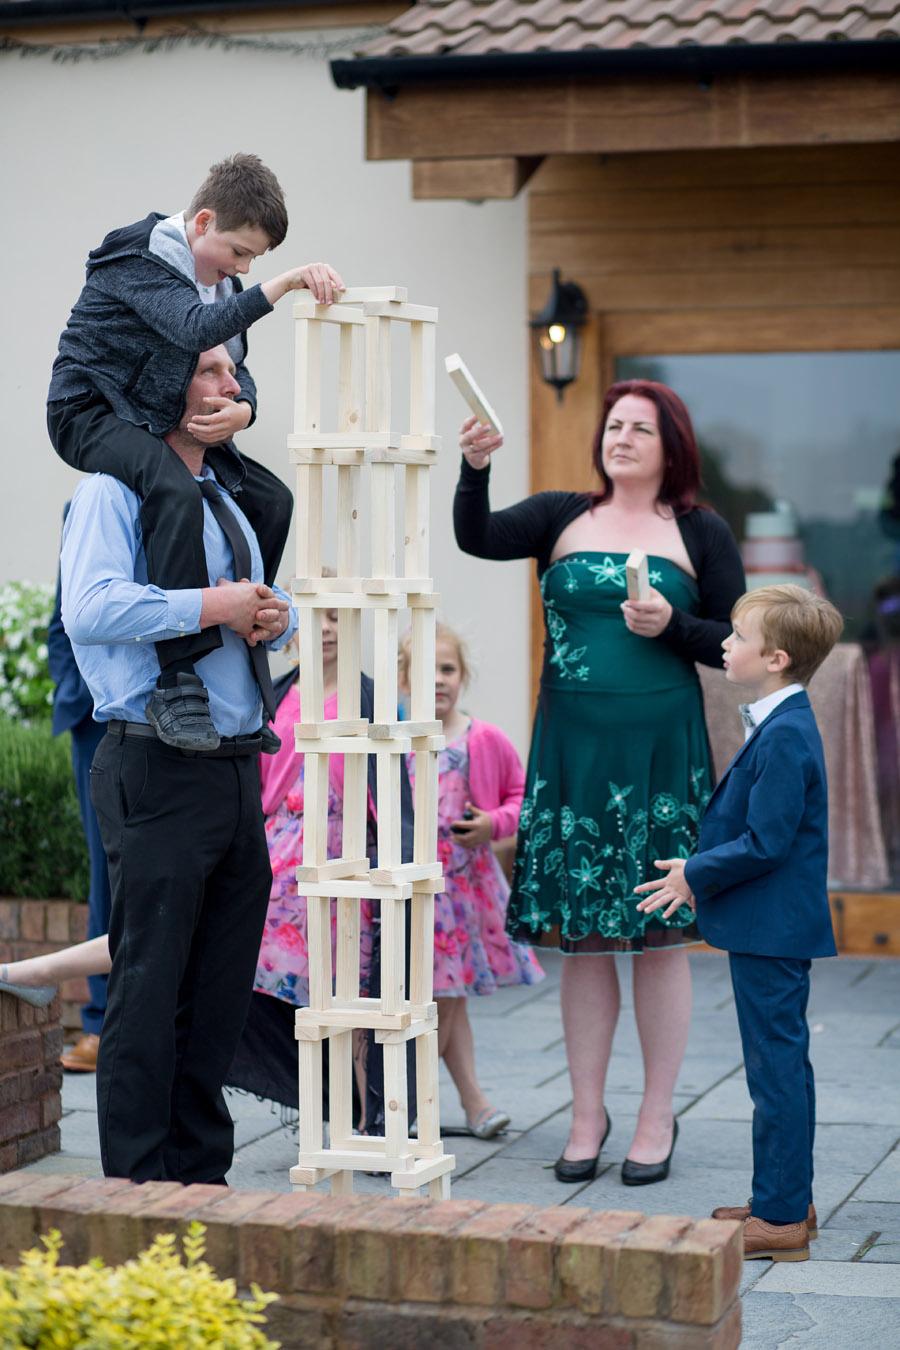 Quantock Lakes wedding styling ideas real wedding photographer Martin Dabek on the English Wedding Blog (25)